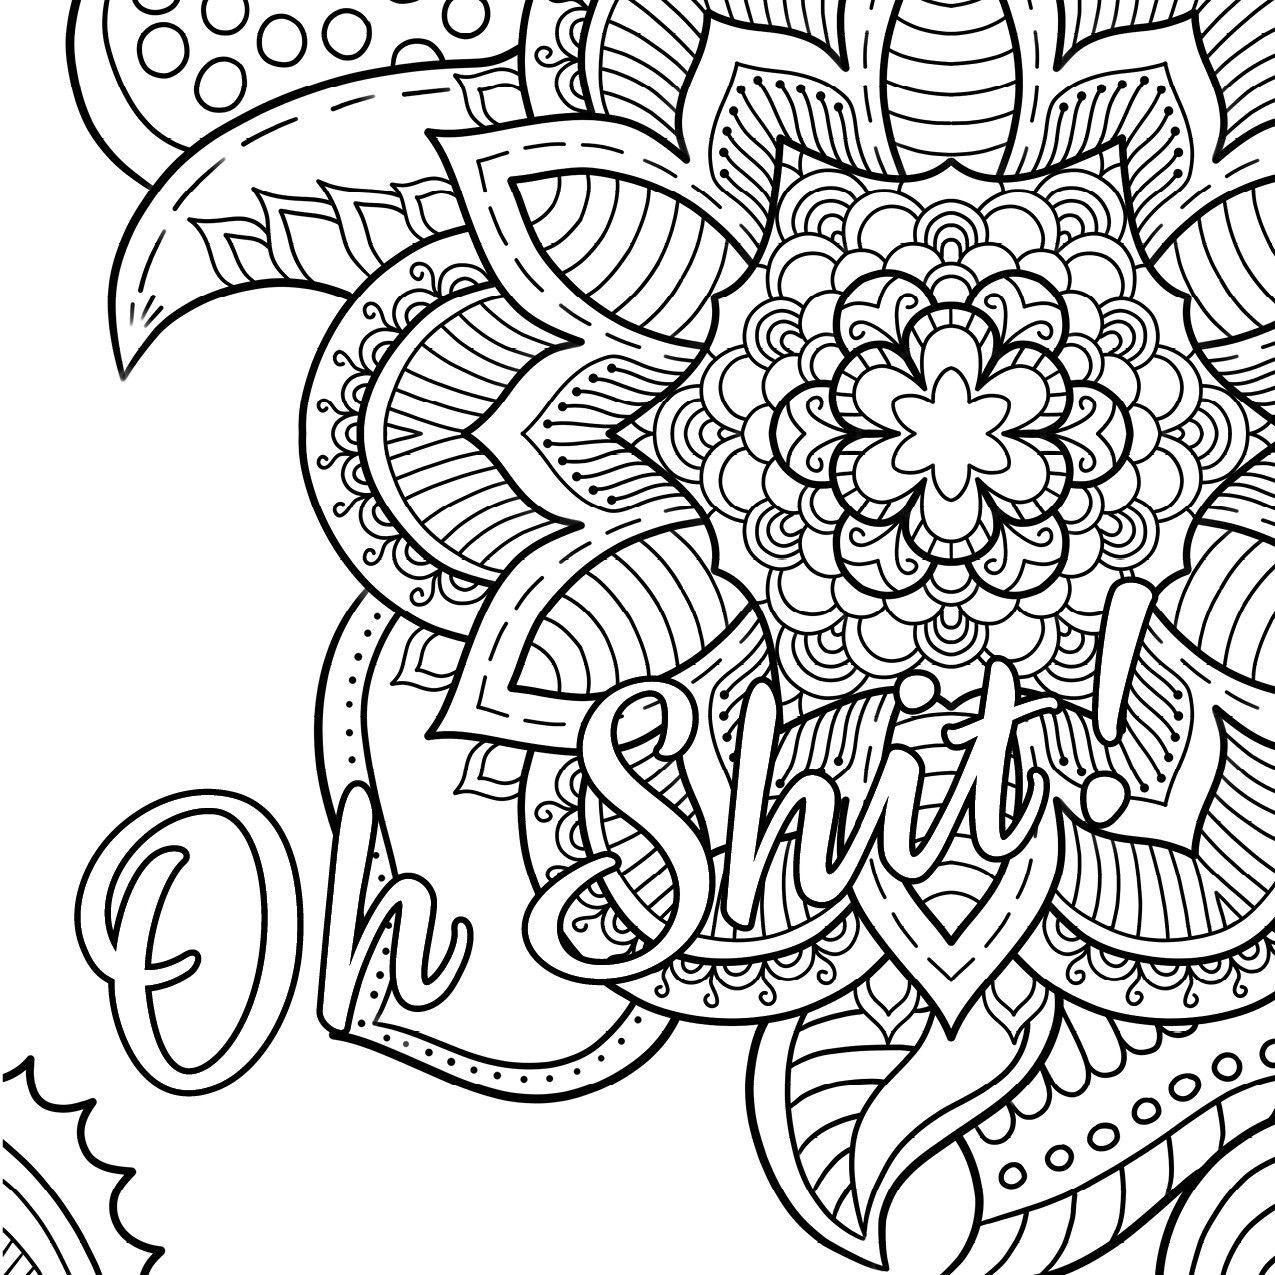 Swear Word Coloring Book #2 Free Printable Coloring Pages ... | free online coloring pages for adults funny